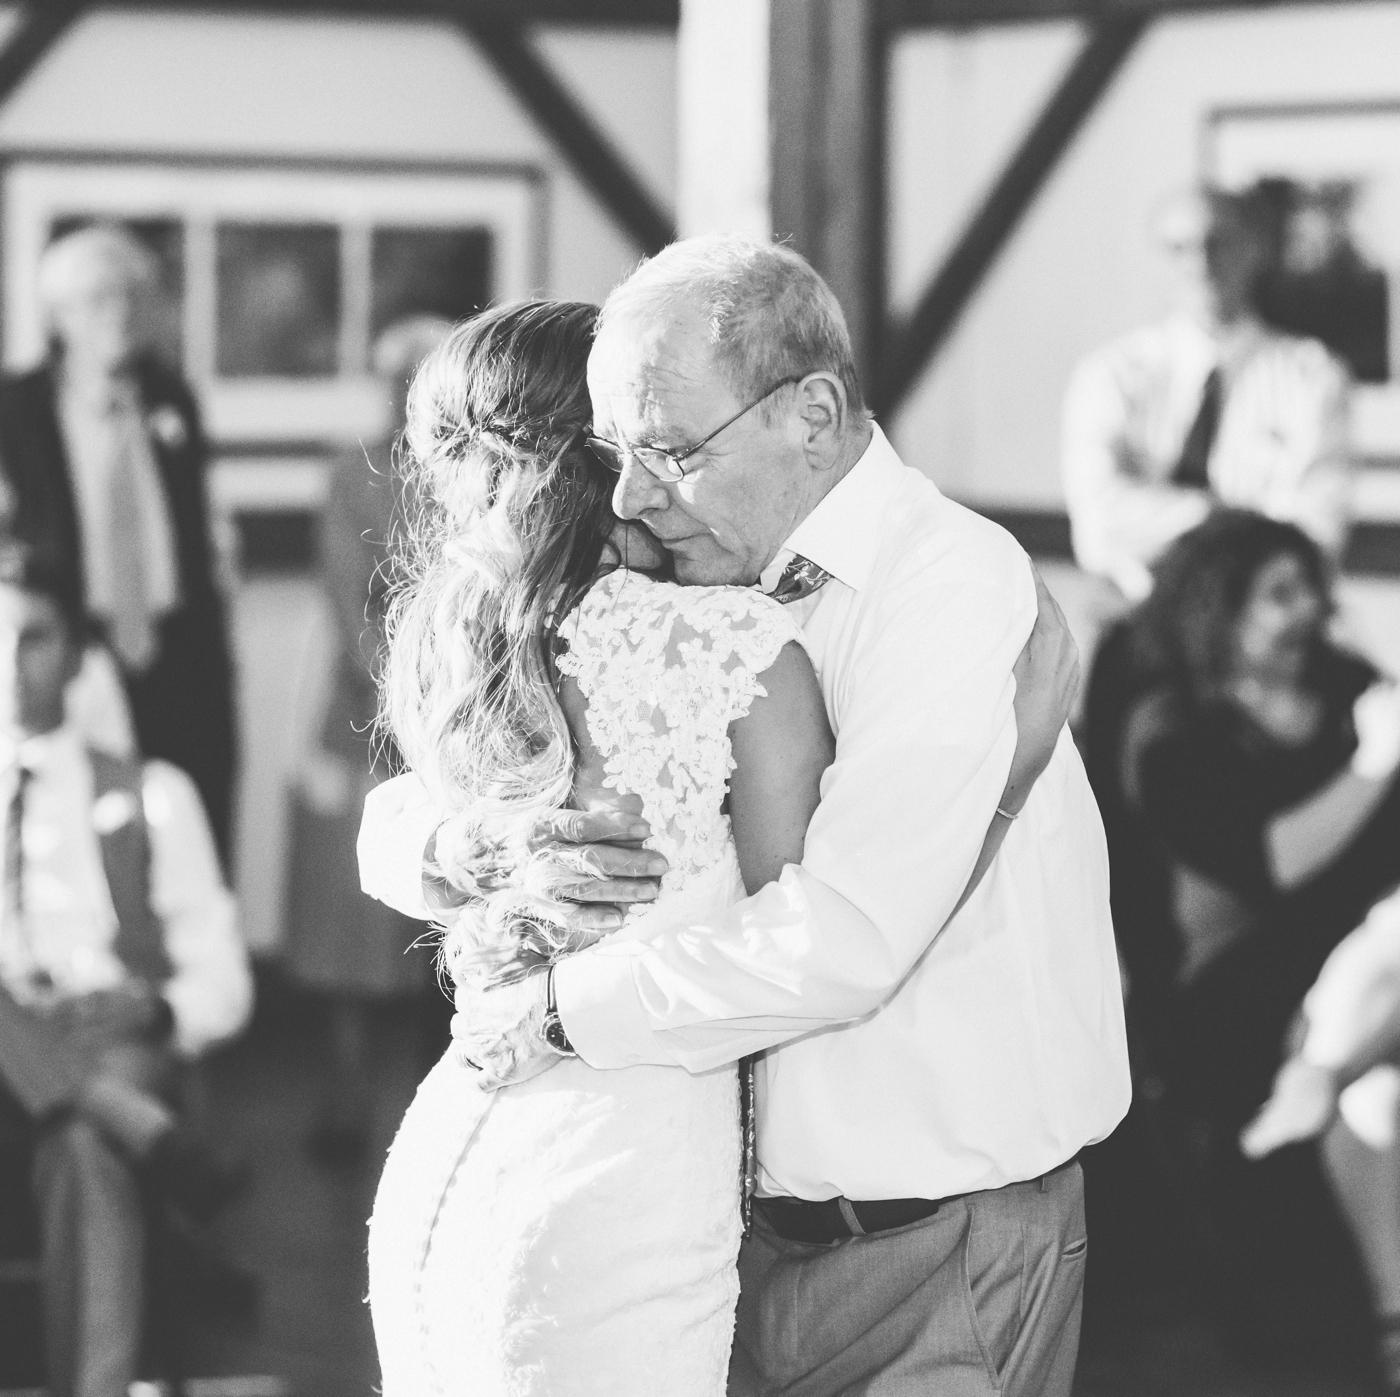 chicago-fine-art-wedding-photography-chiapetta47